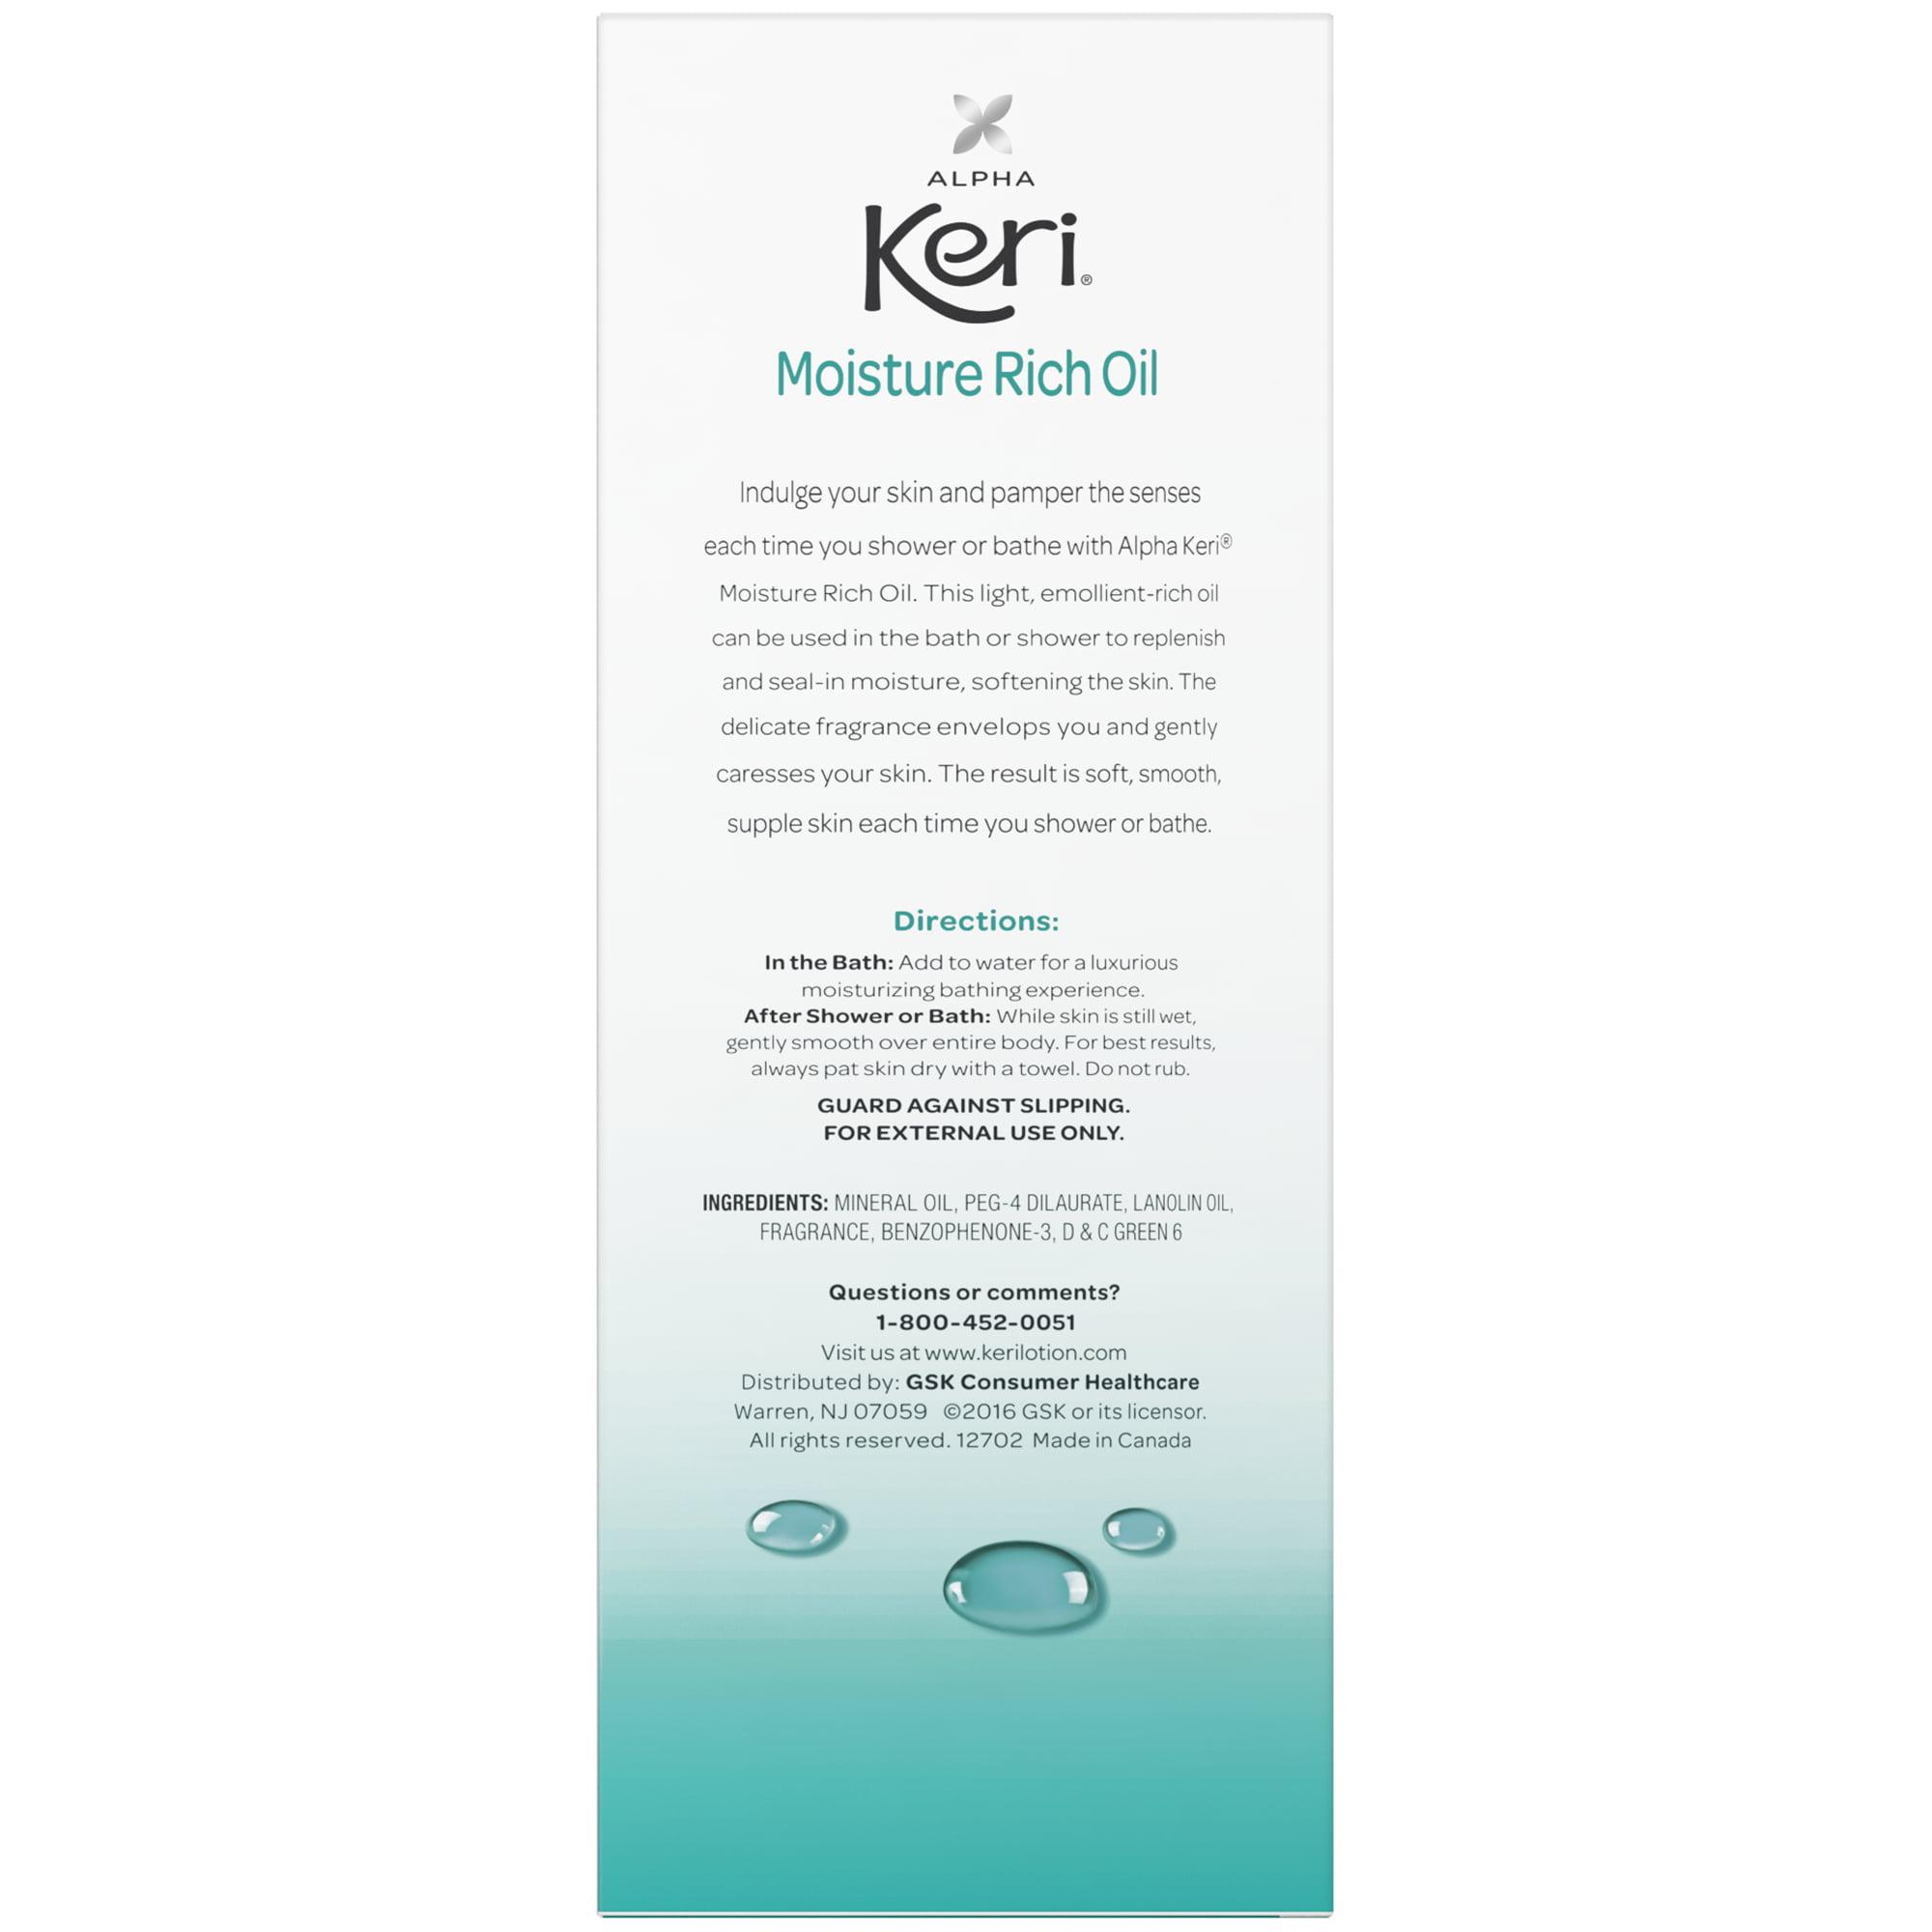 Alpha Keri Shower Bath Moisture Rich Oil 16 Oz